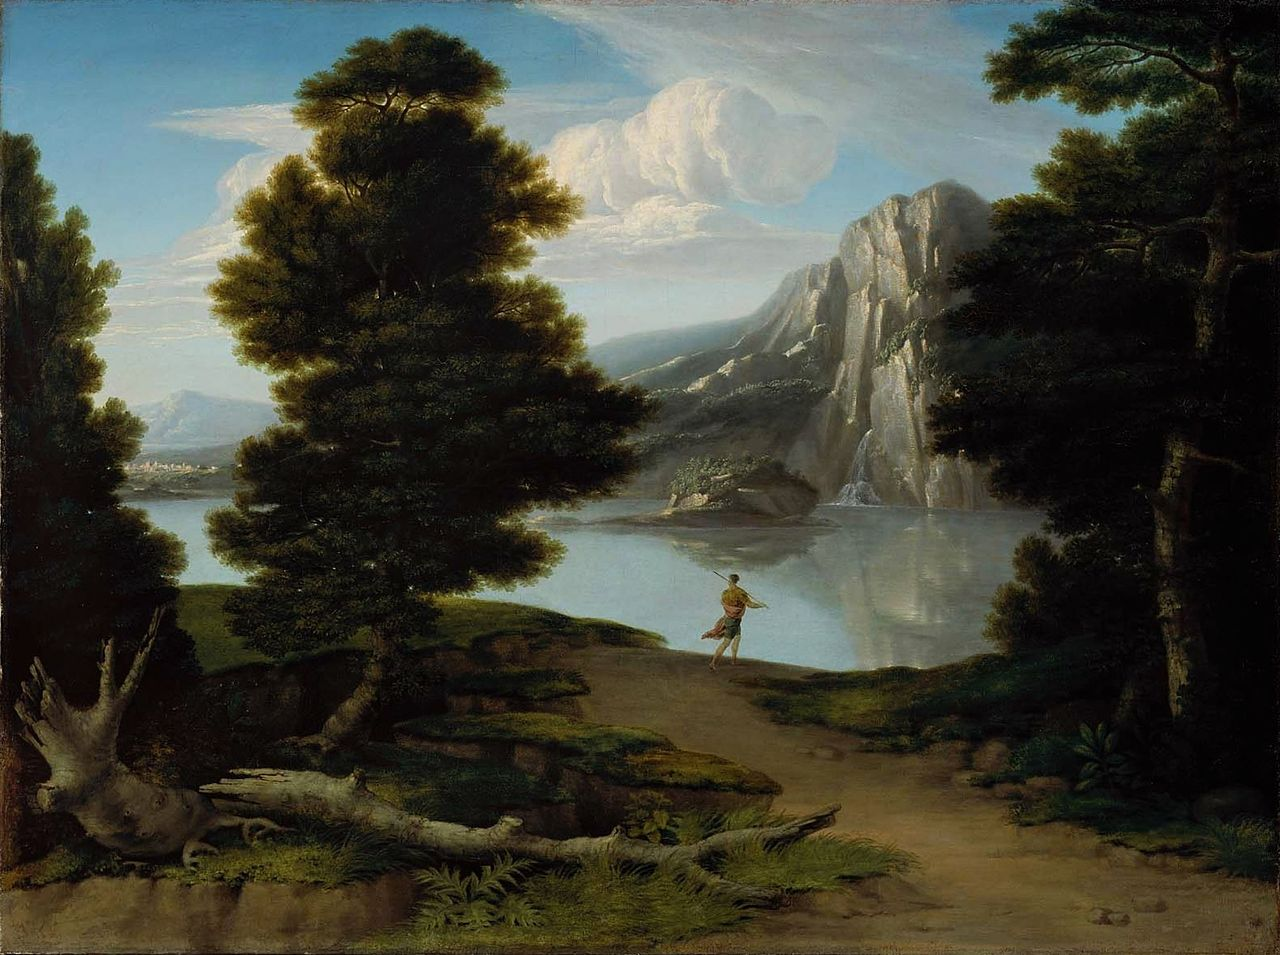 Washington_Allston_-_Landscape_with_Lake_(1804).jpg